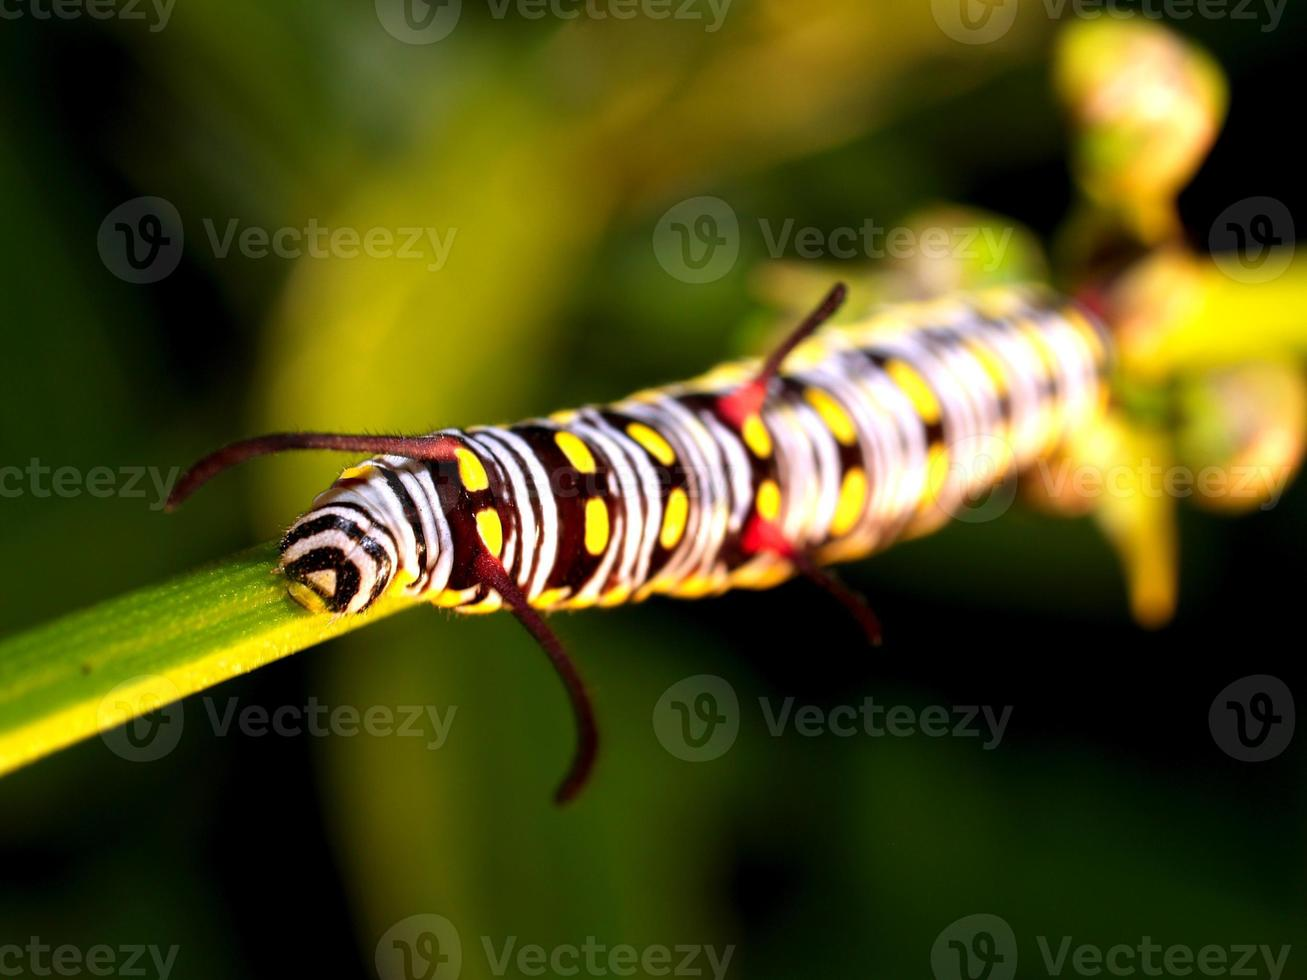 Caterpillar worm in nature photo